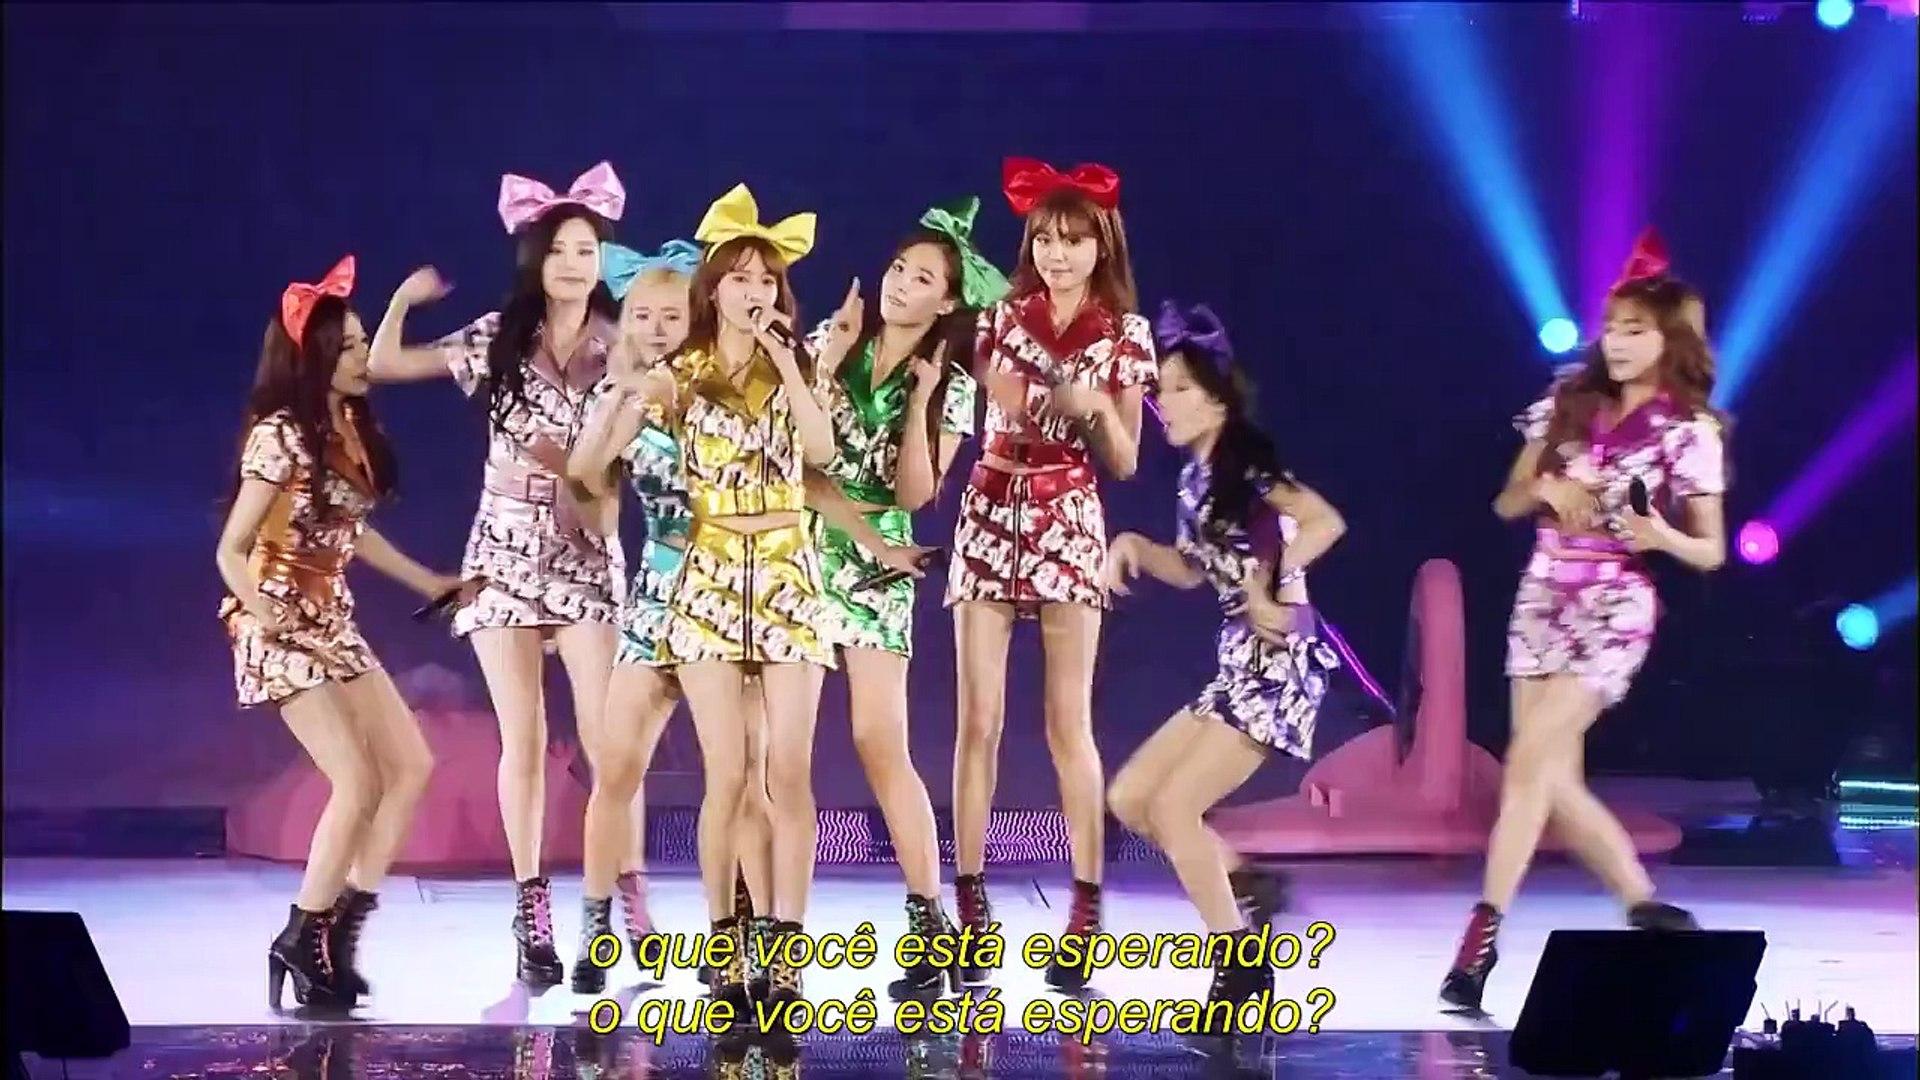 Girls' Generation - Love & Girls (The Best Live at Tokyo Dome) - legendado